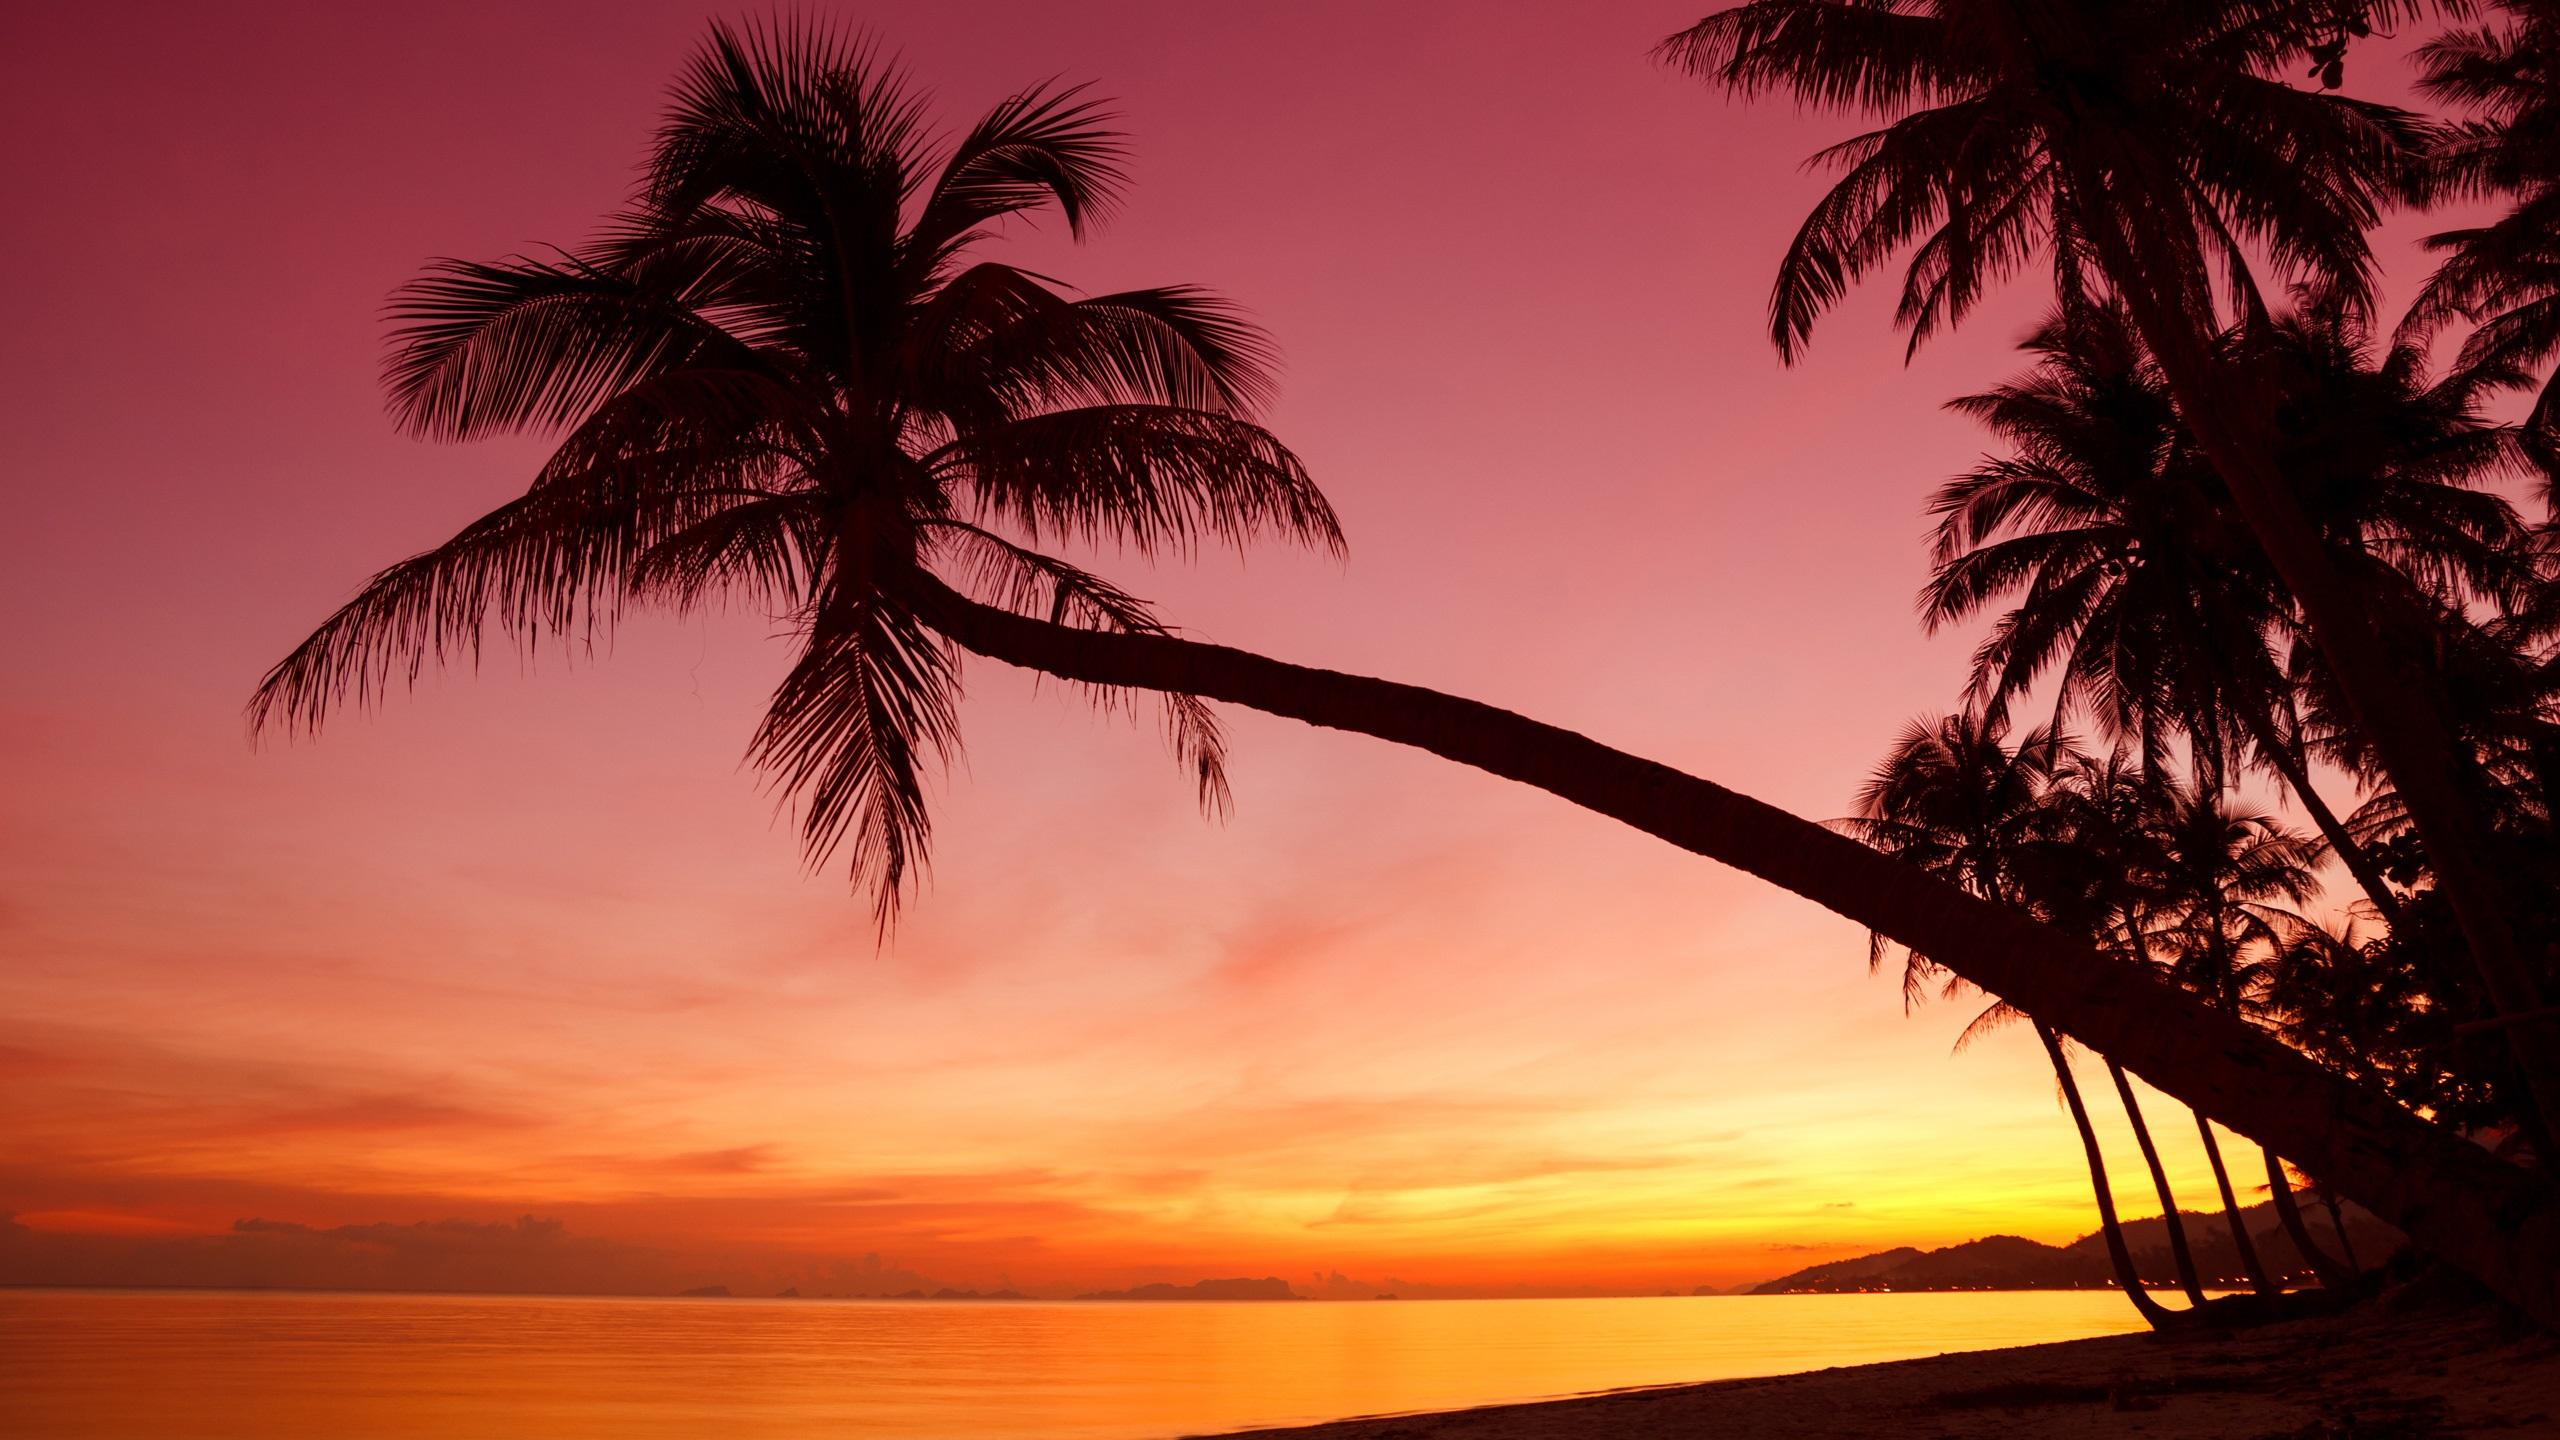 Wallpaper Tropical Sunset Palm Trees Silhouette Beach